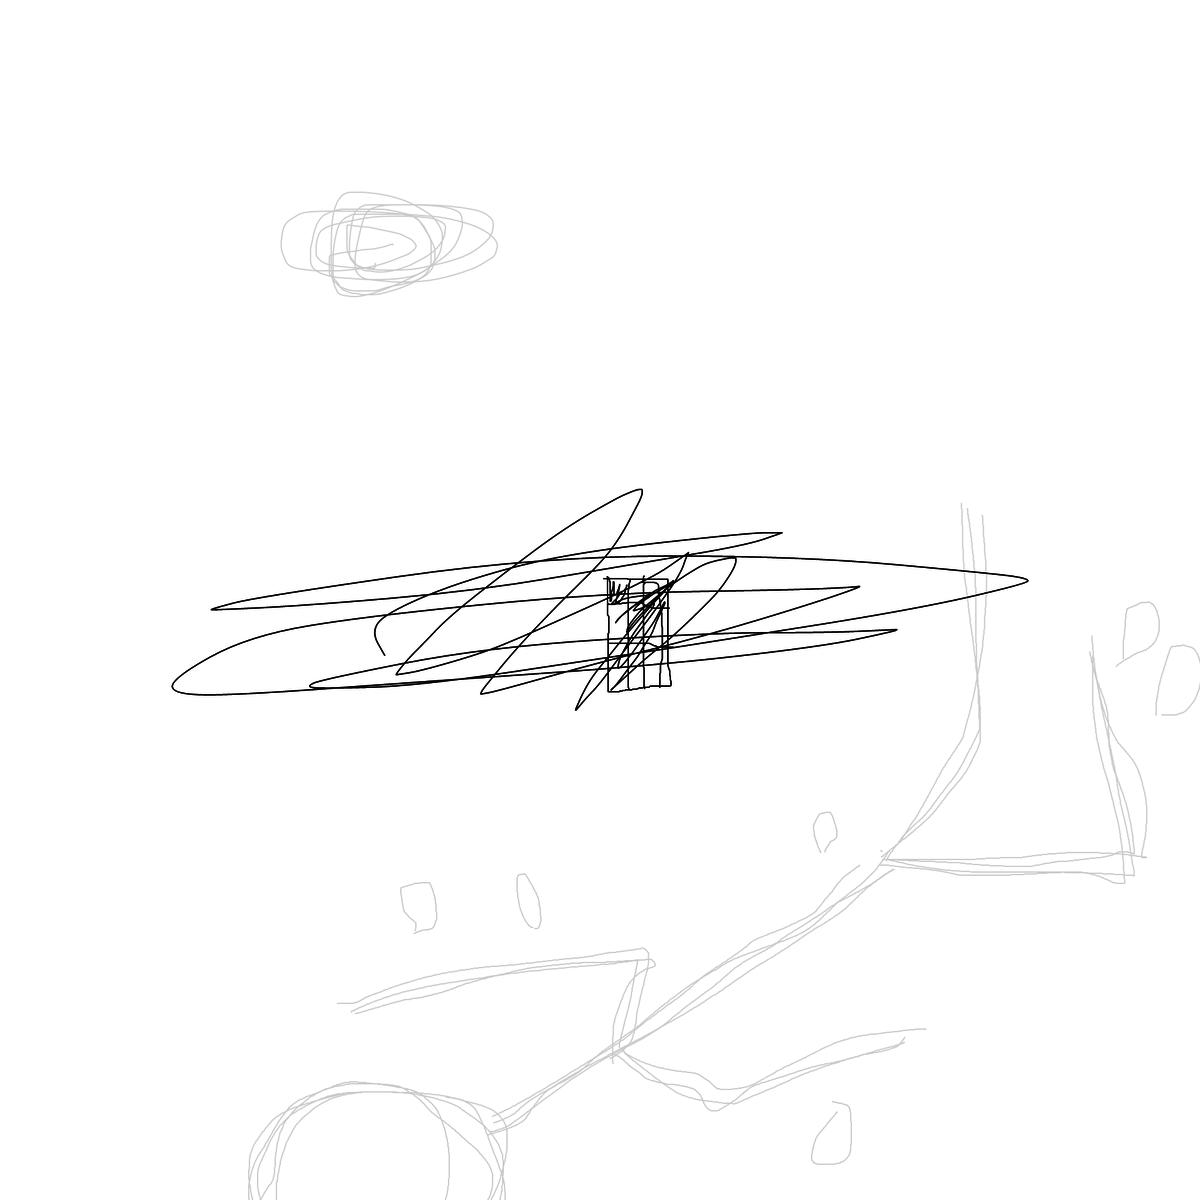 BAAAM drawing#18680 lat:45.5558471679687500lng: -73.6644287109375000